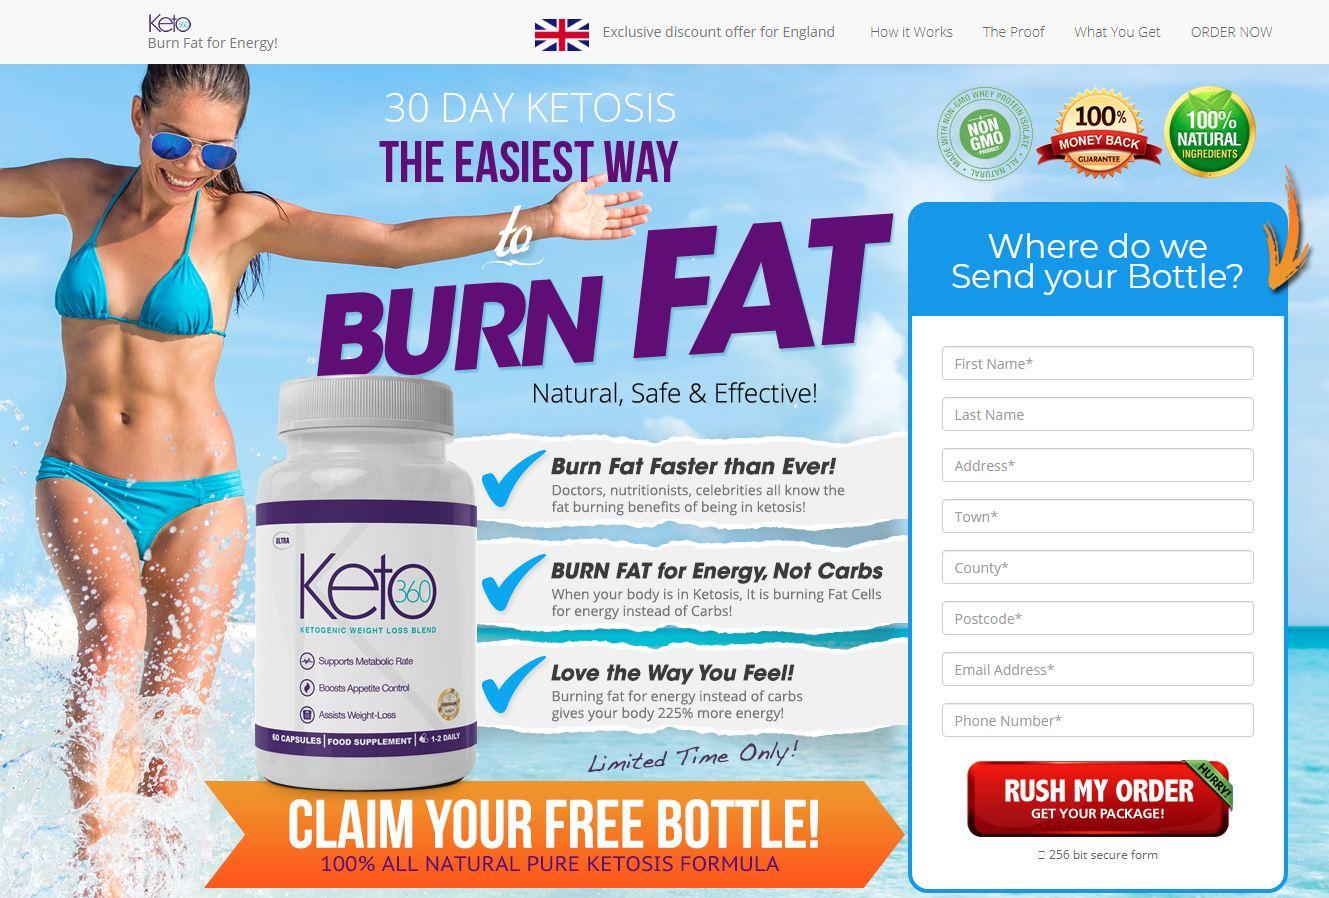 Keto360 UK